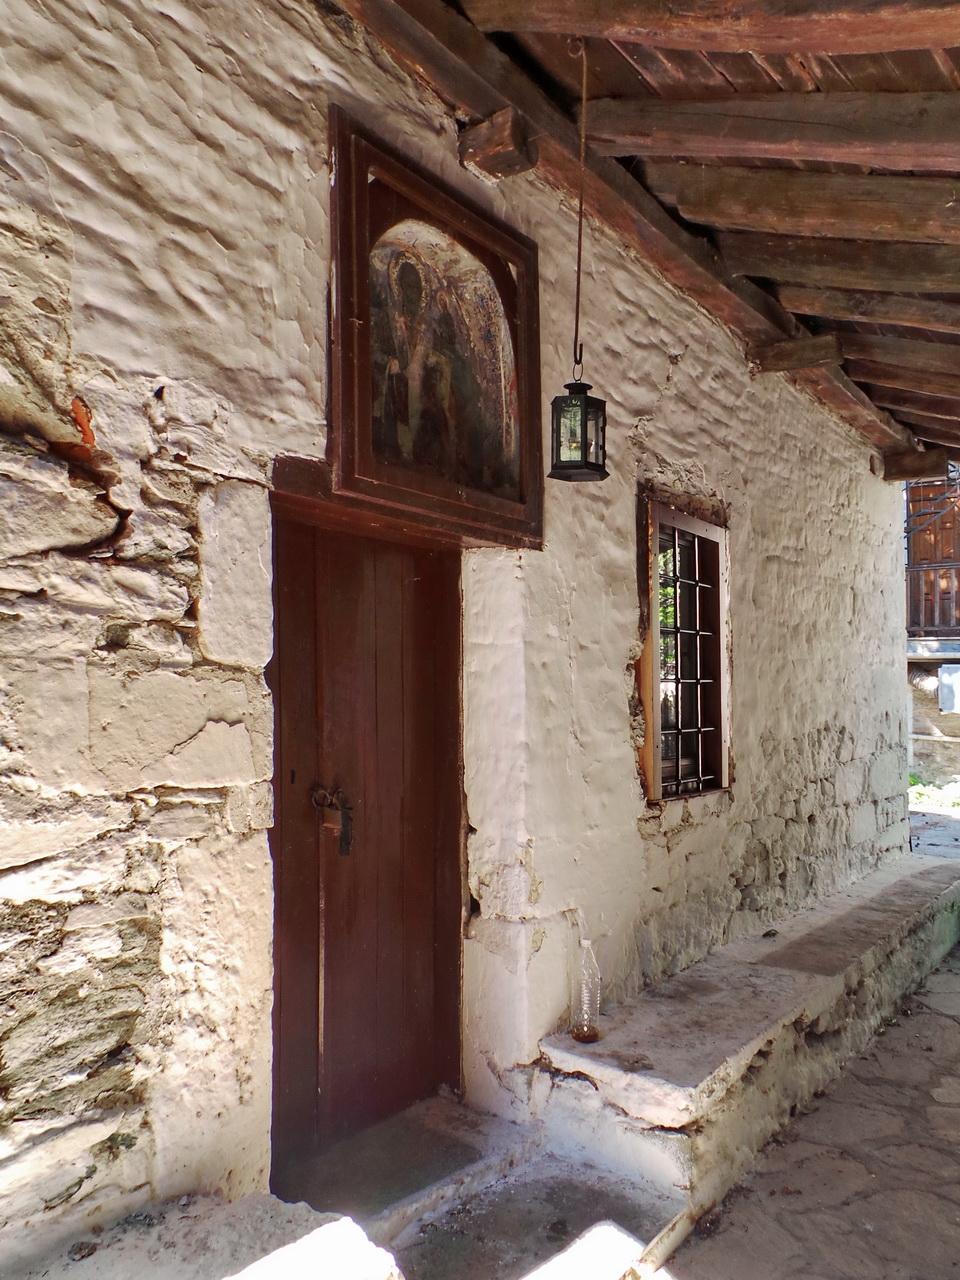 Find old frescos in the church of Agios Nikolaos Chorefto Pelion